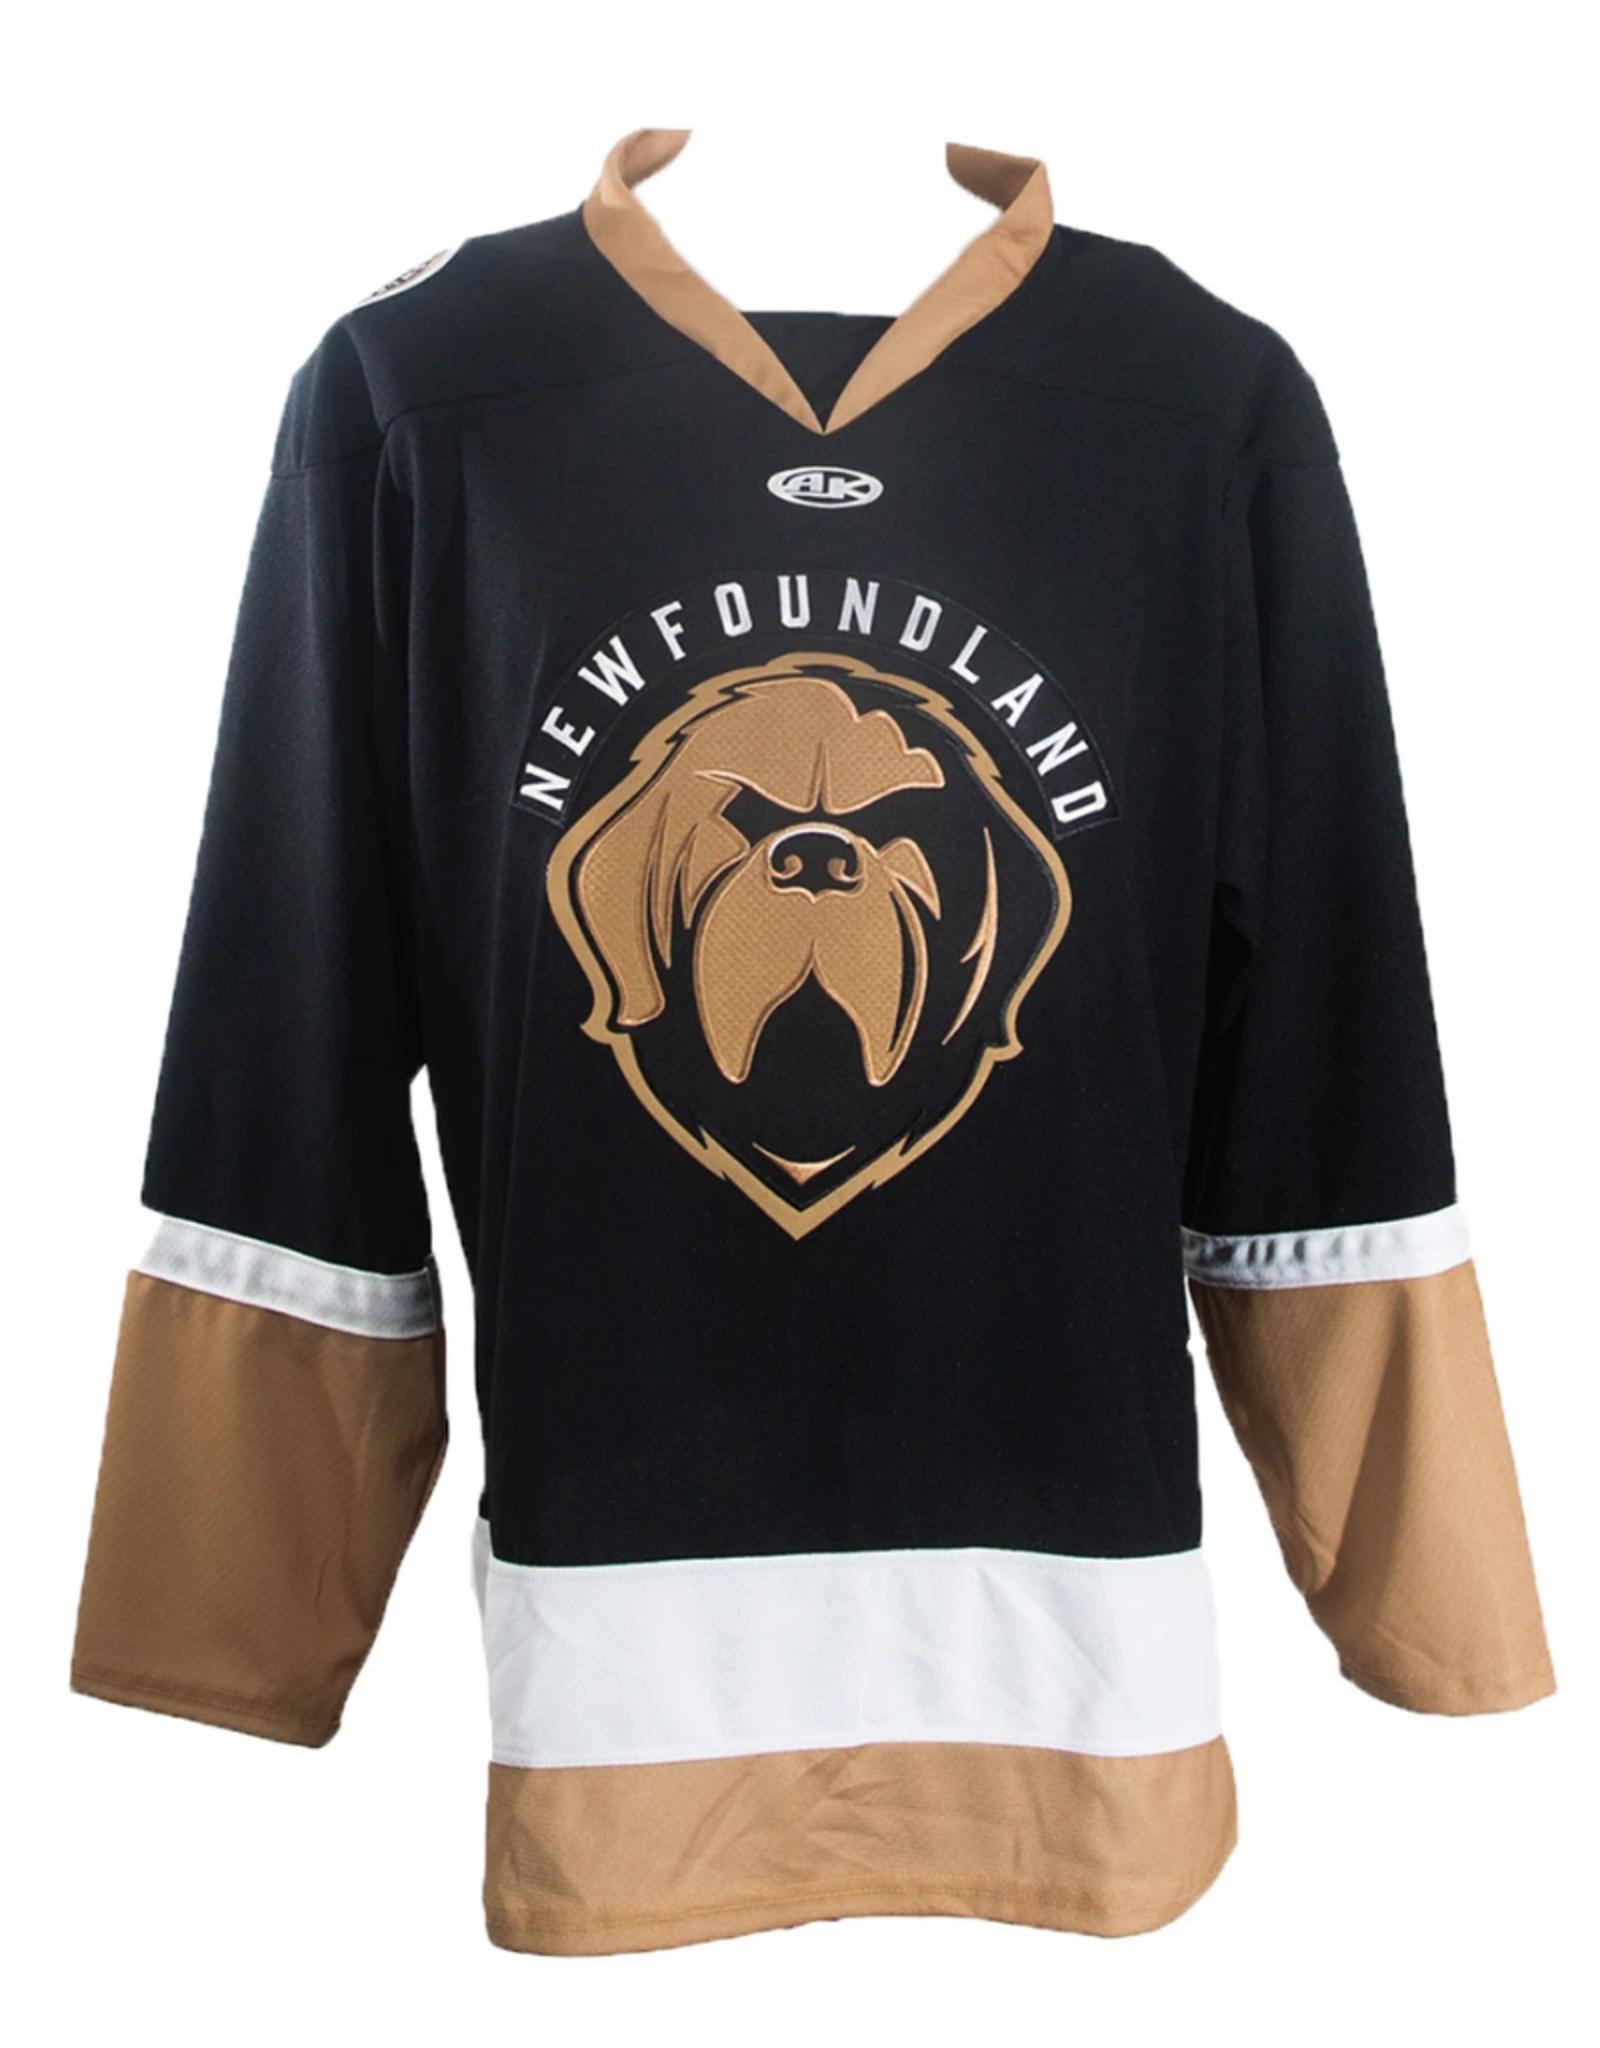 ECHL Youth Replica Newfoundland Growlers Jersey Black